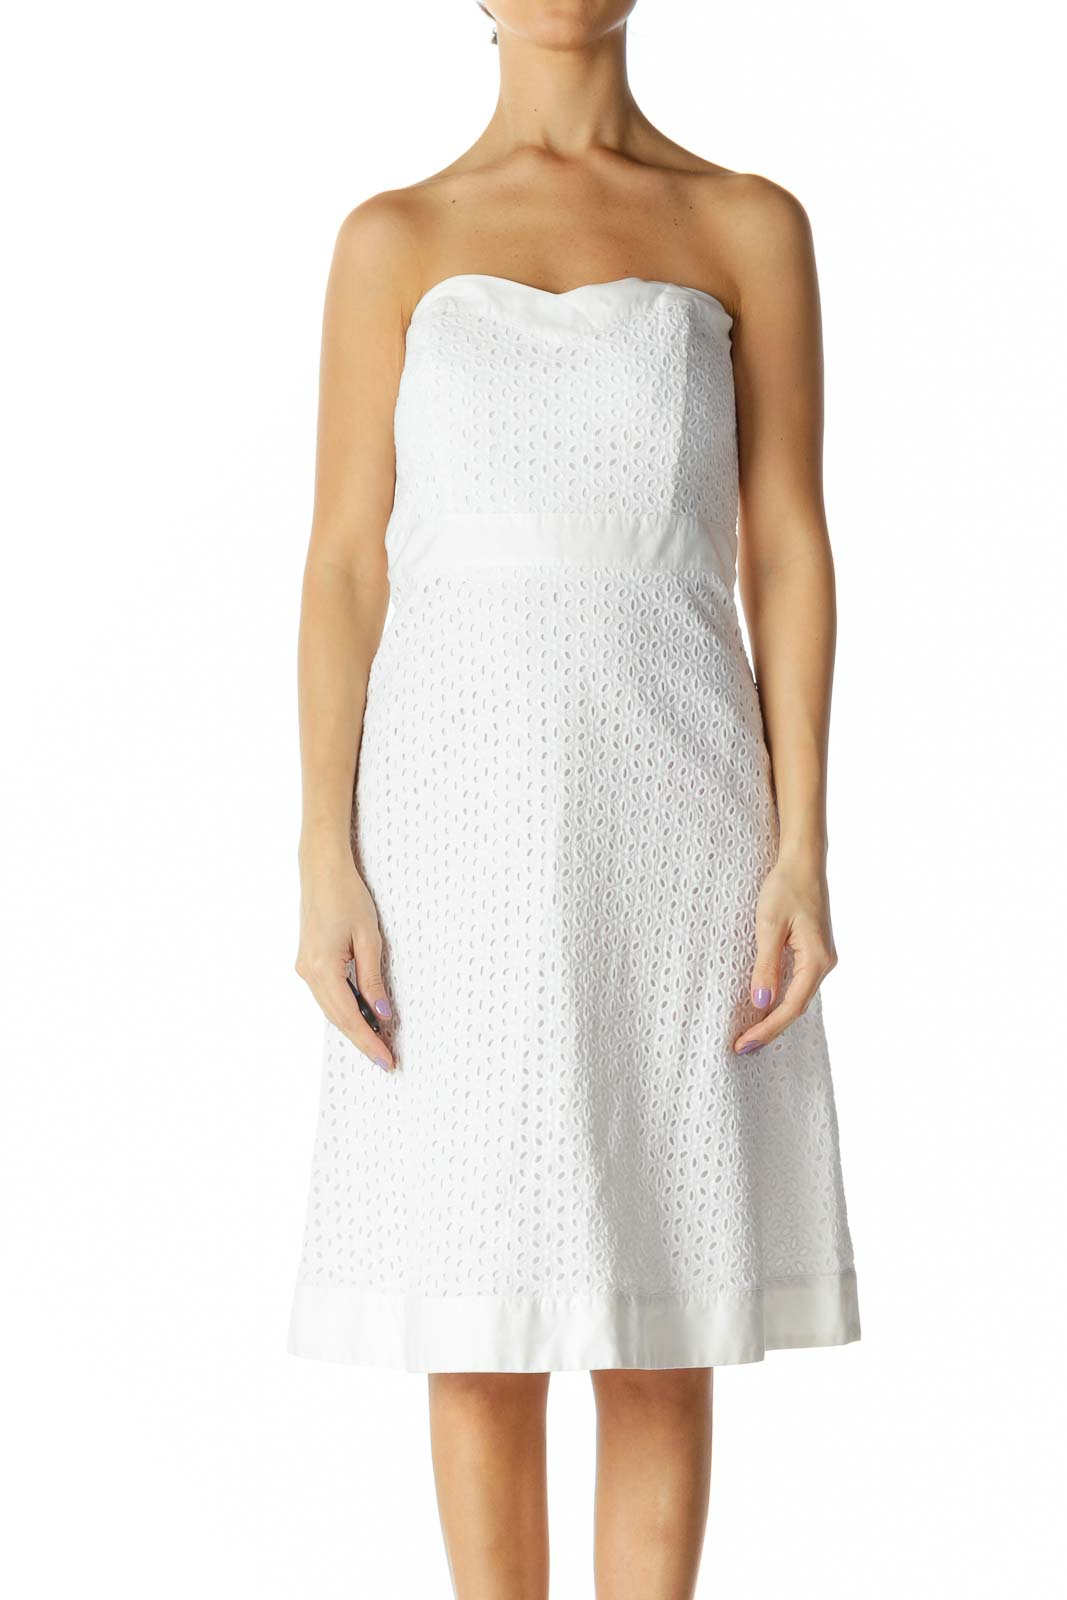 White Chic A-Line Dress